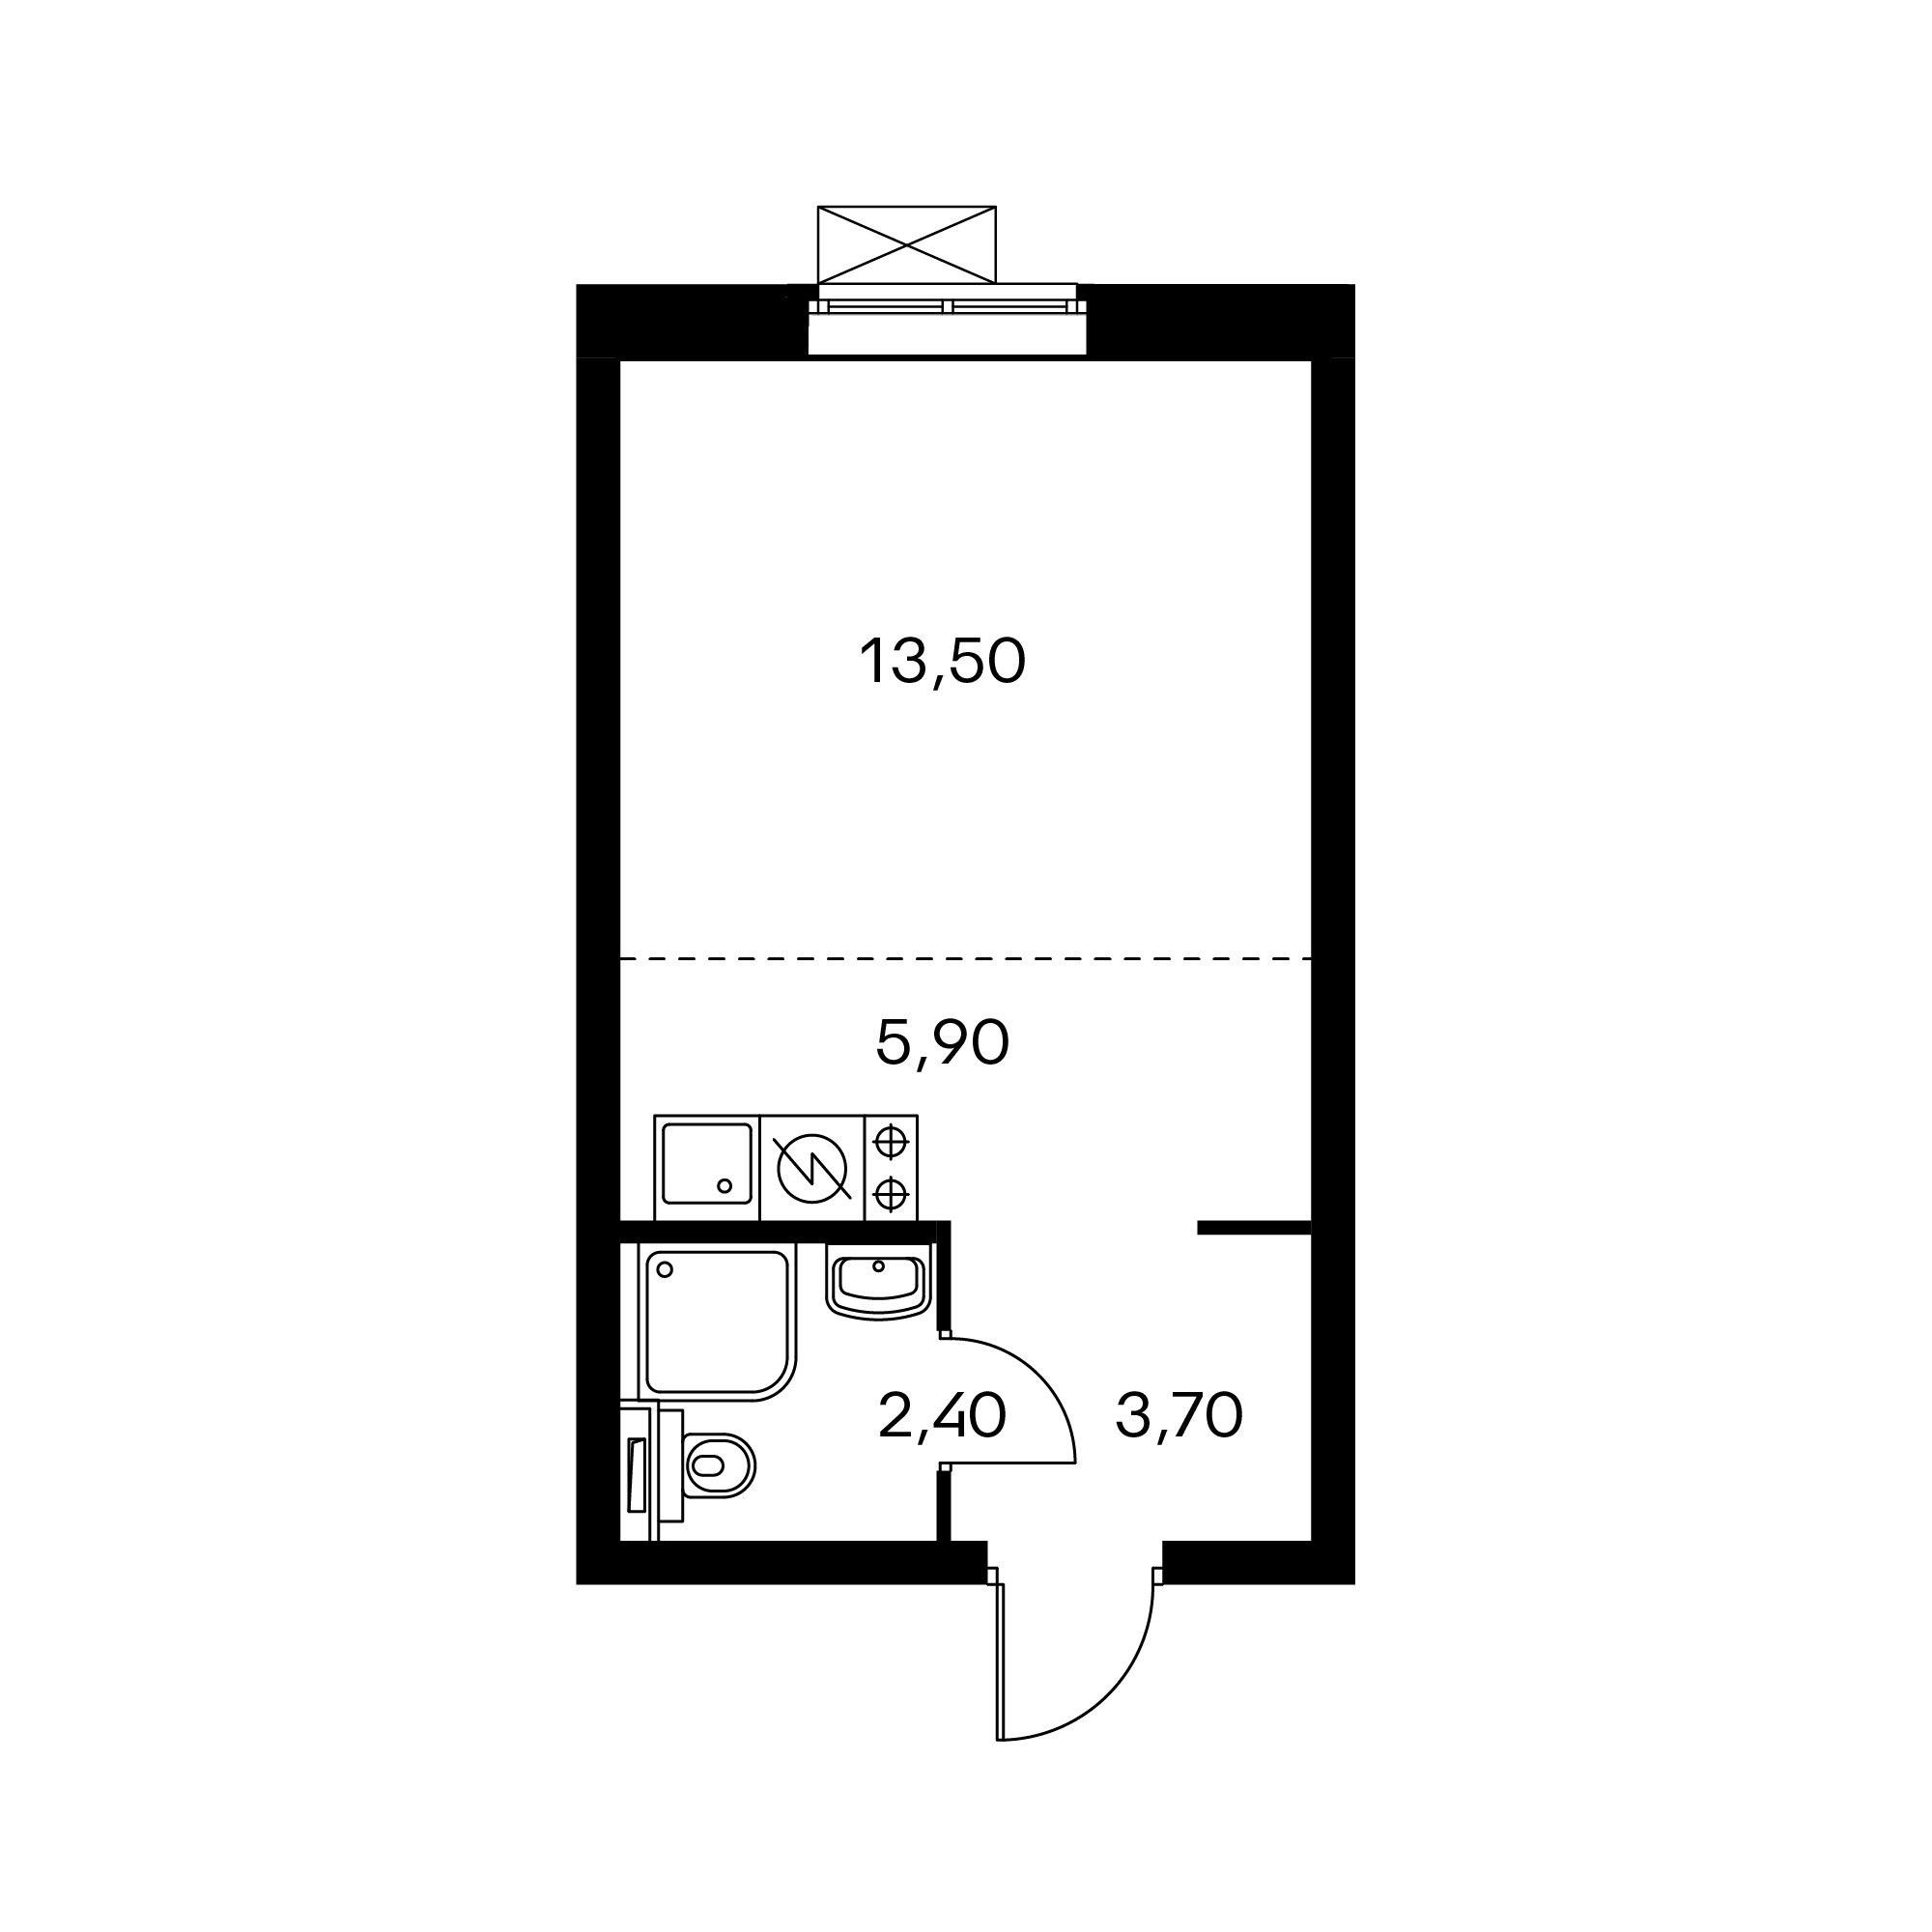 1NM1_4.2-1.1